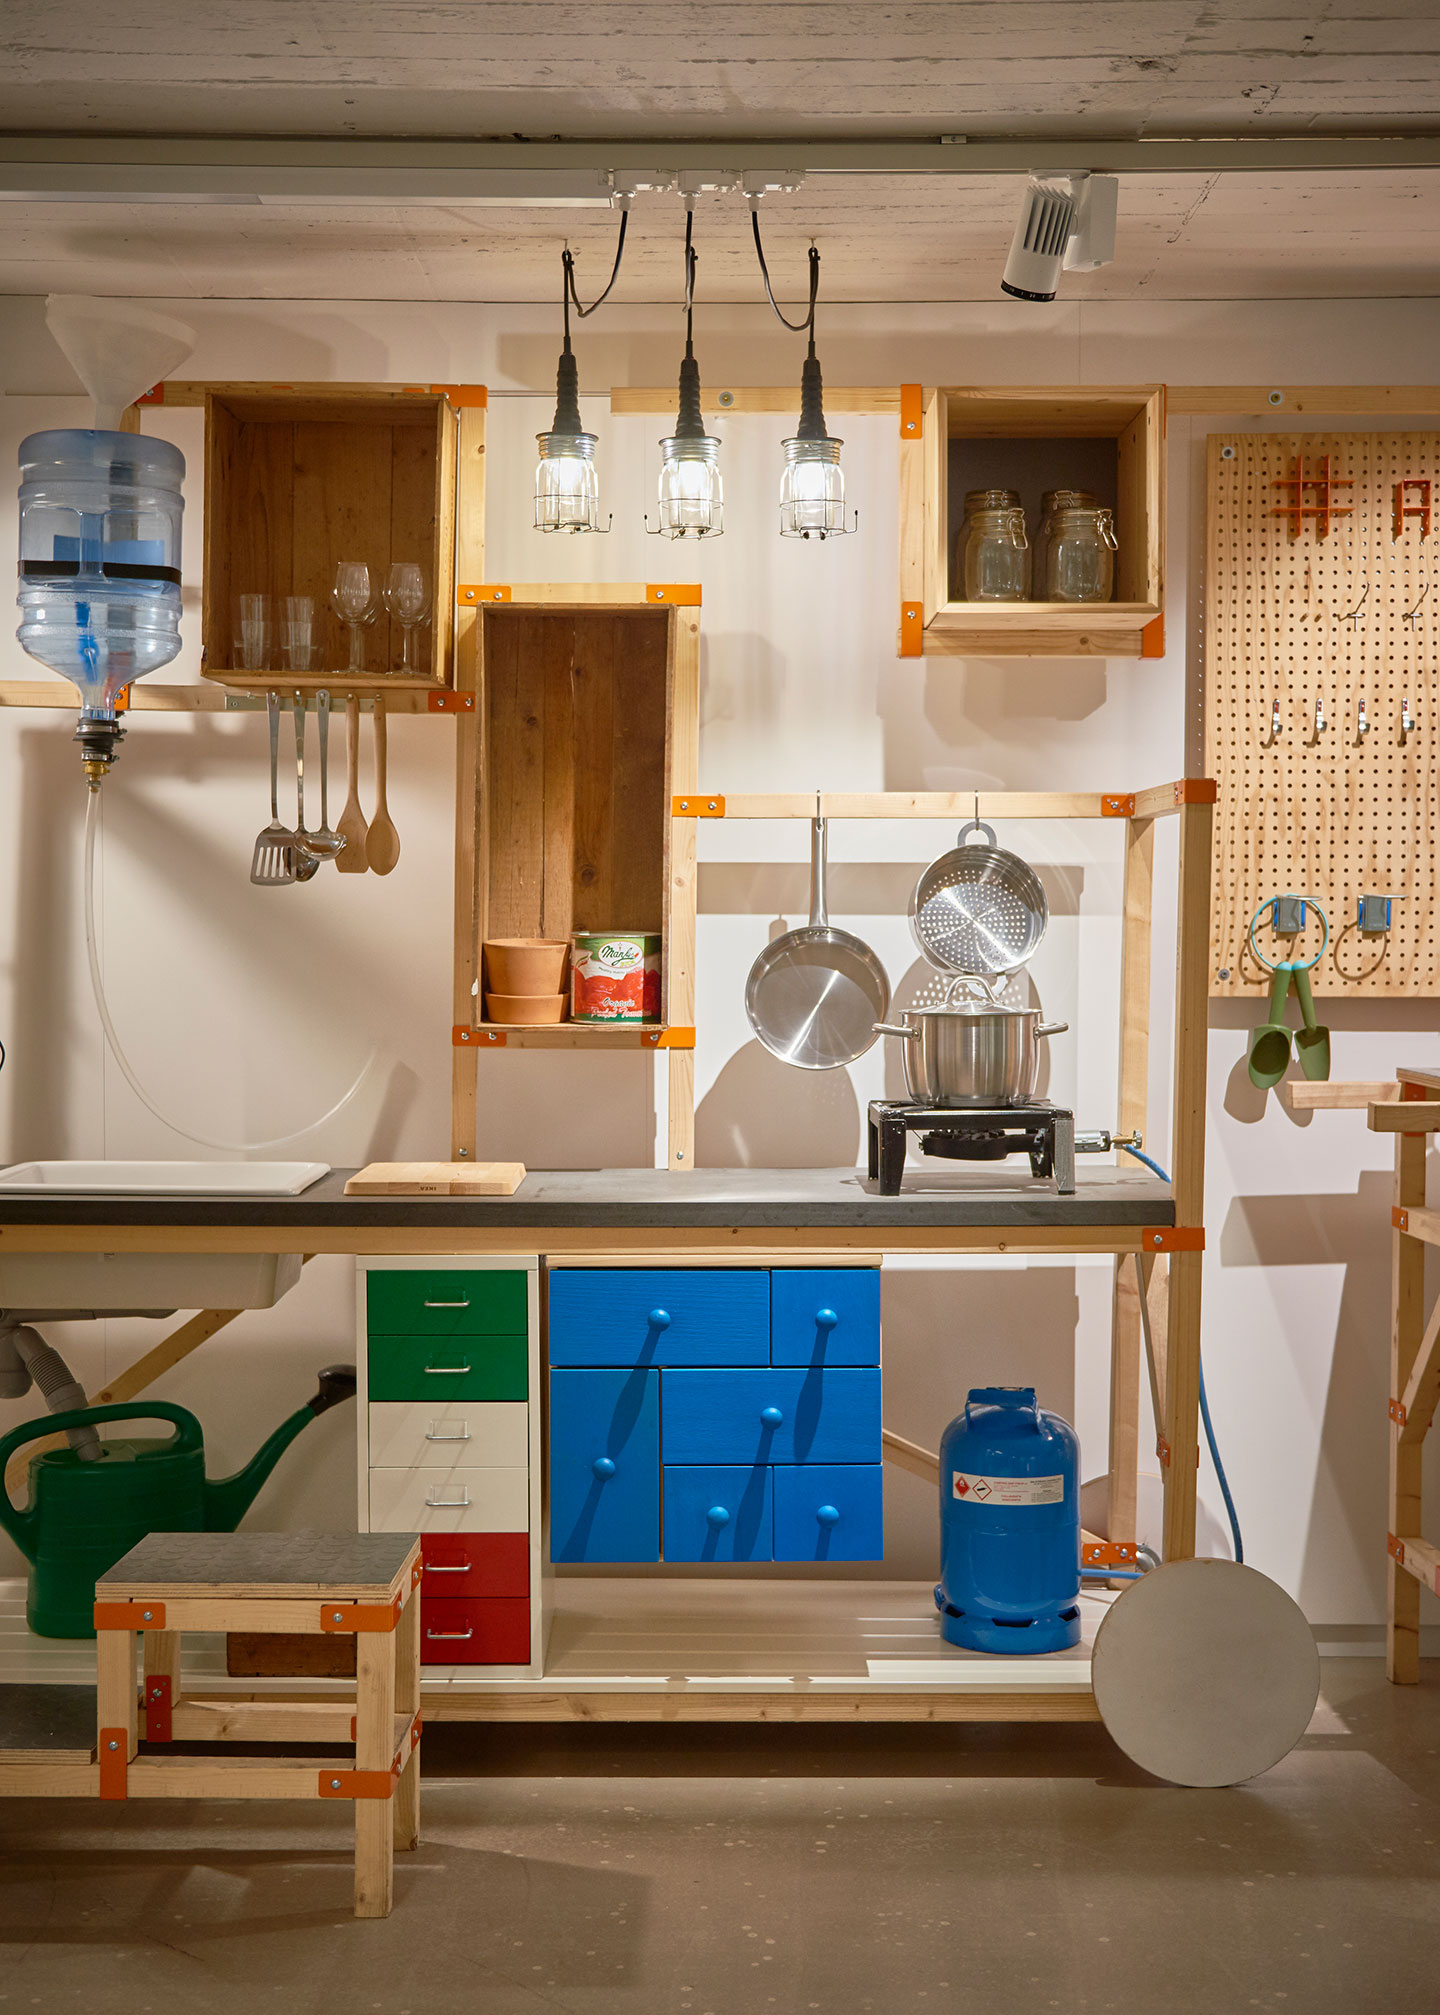 Excepcional Ikea Cocina Libre De Descarga De Software De Diseño ...